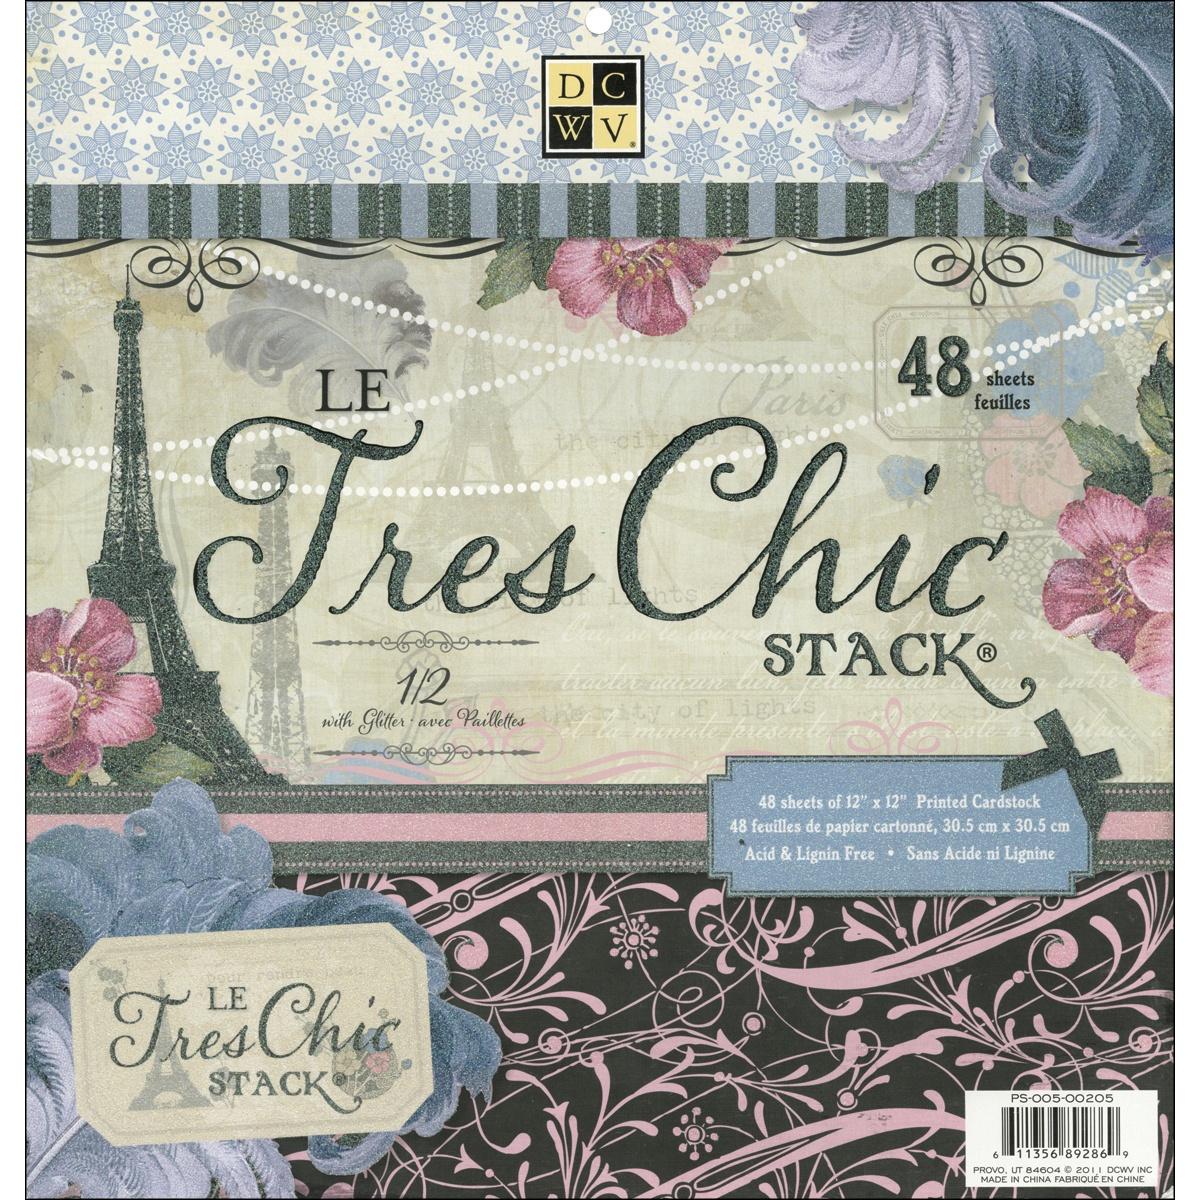 Набор бумаги для скрапбукинга Le Tres Chic  (48 листов, 30 х 30 см.) набор д творчества набор бумаги д скрапбукинга цветущее лето 30 5см 30 5см 017 sb